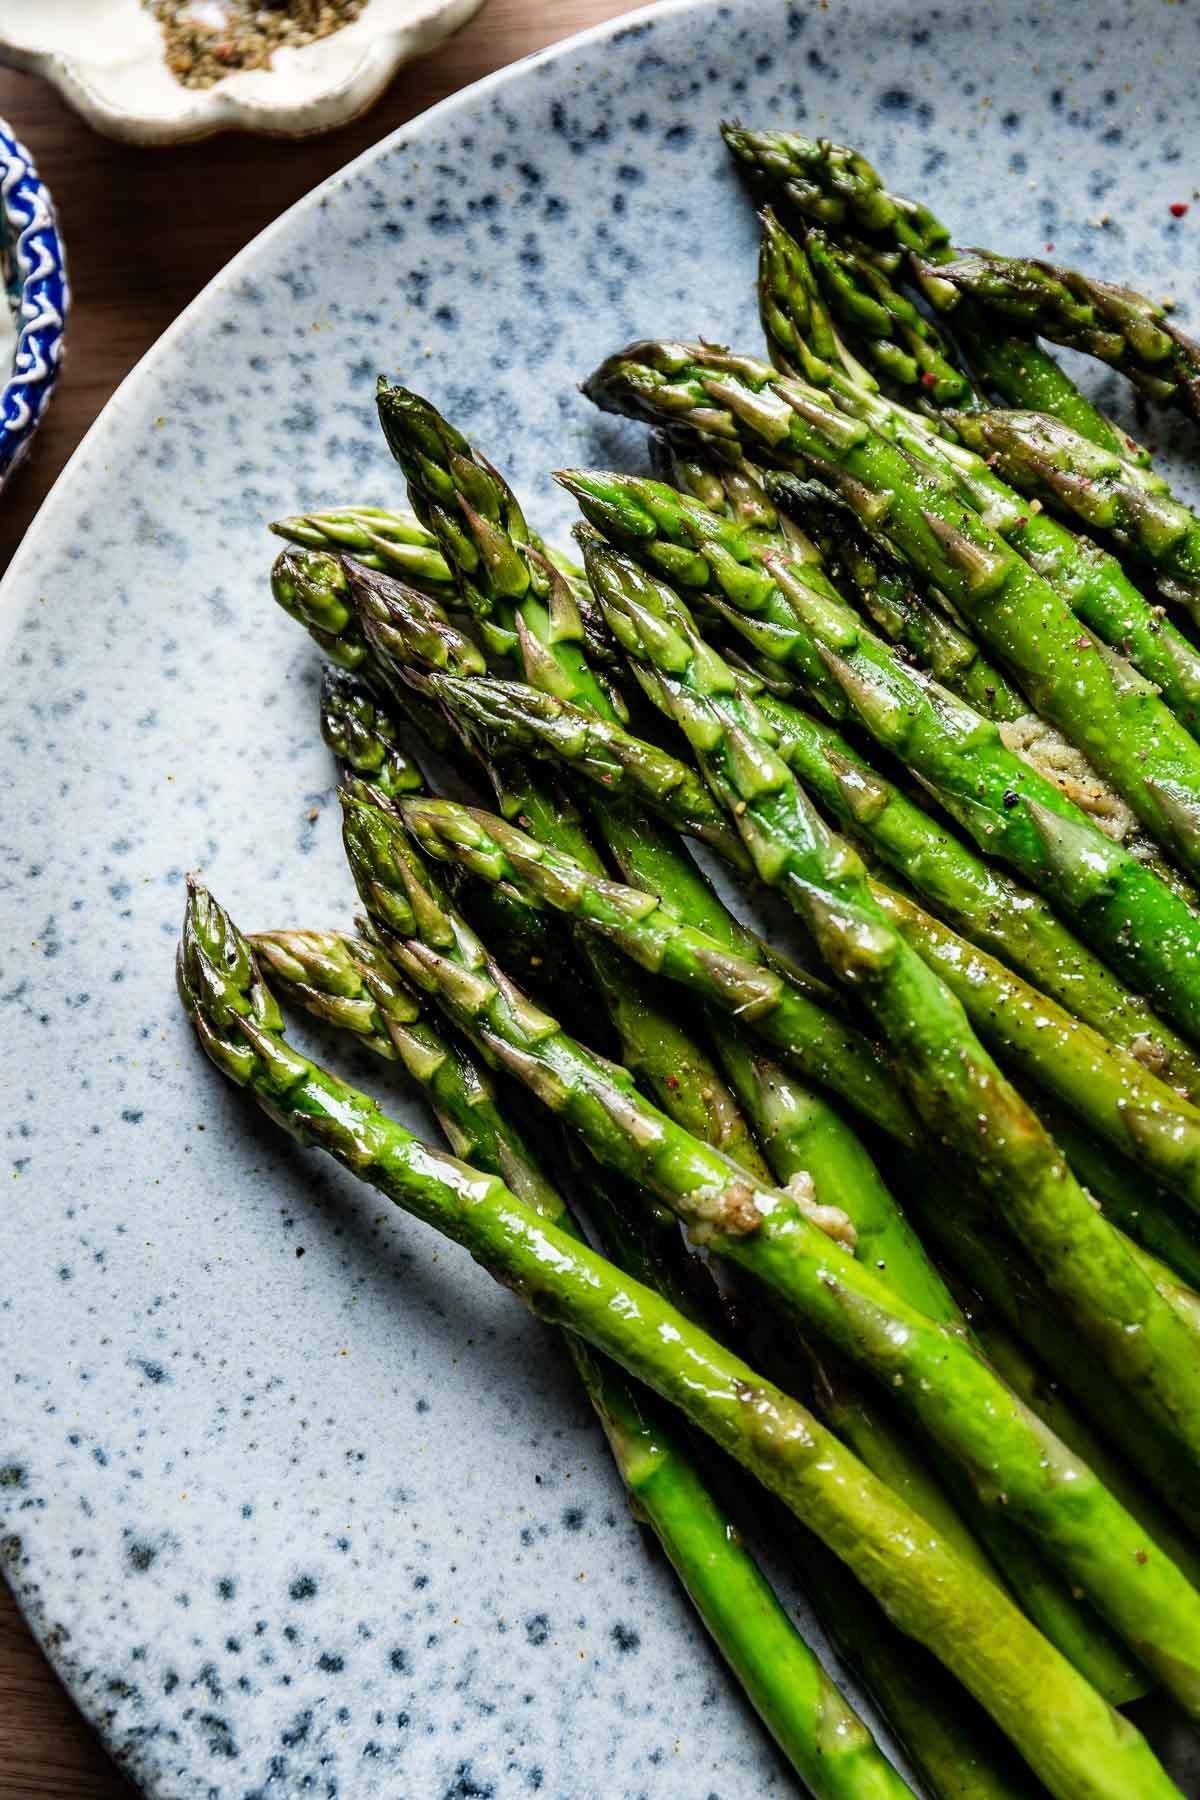 Garlic Butter Asparagus on a plate close up